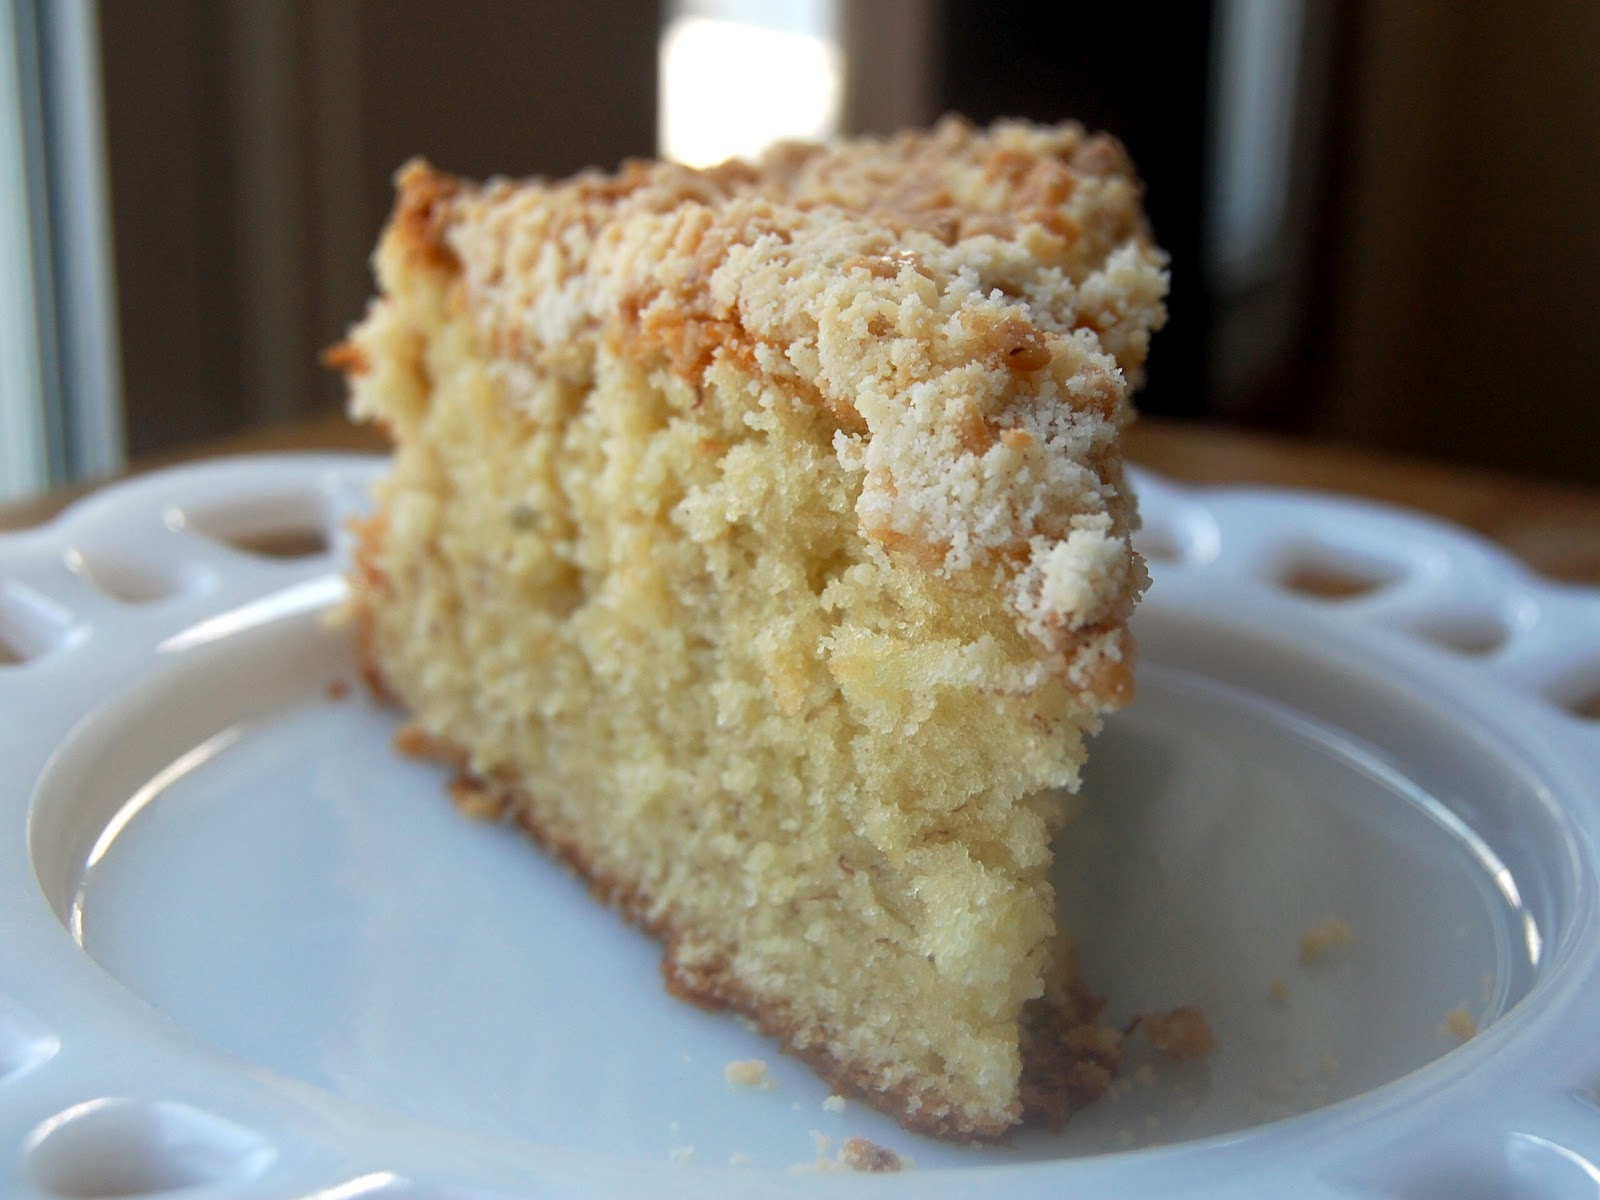 Marcy Goldman Sour Cream Coffee Cake